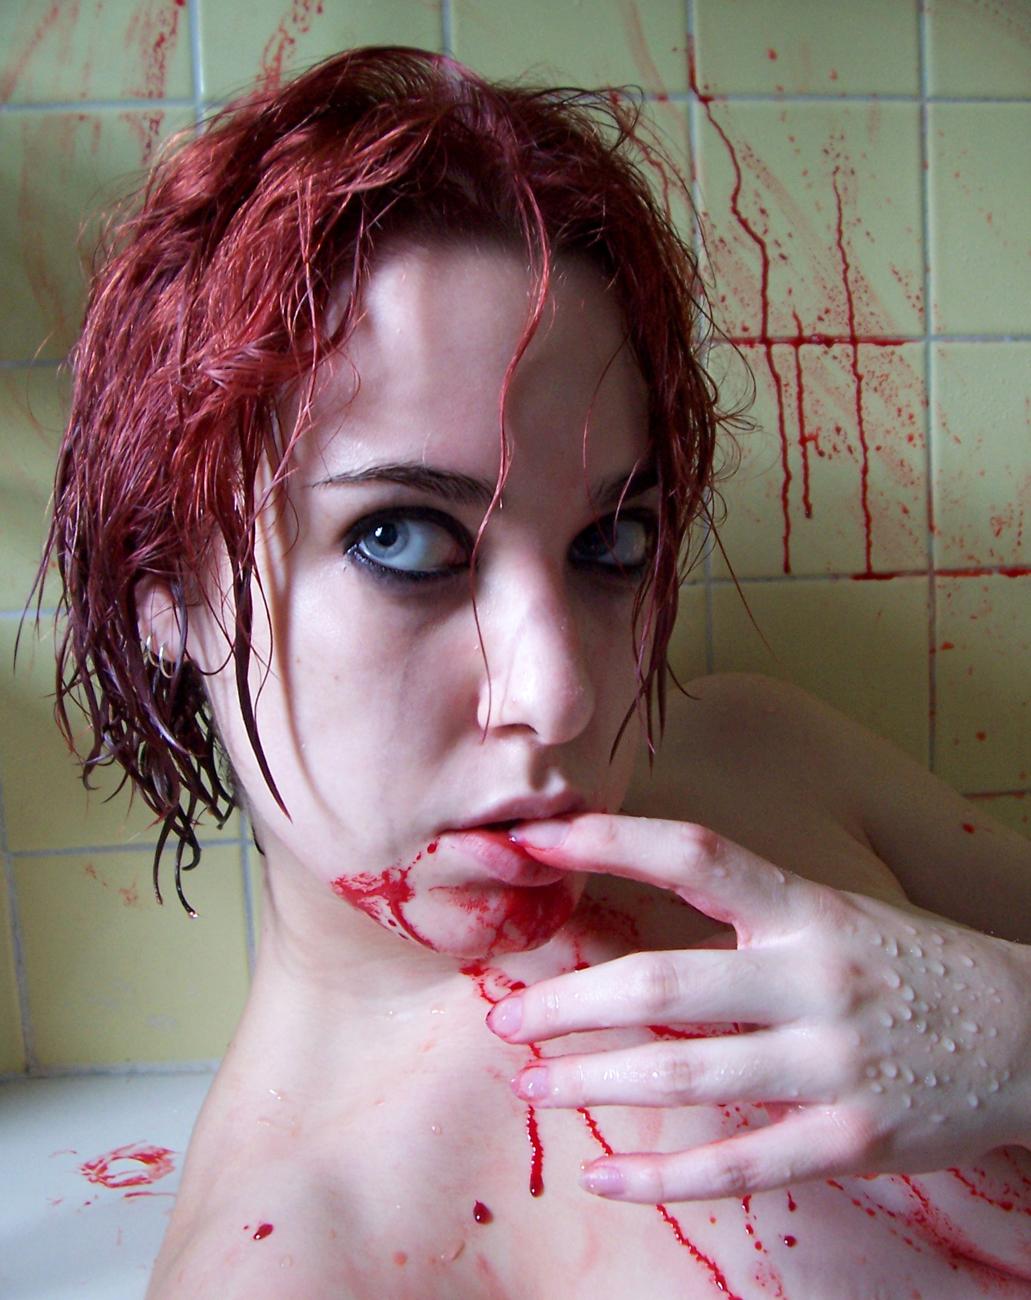 Blood Shower VIII by fetishfaerie-stock